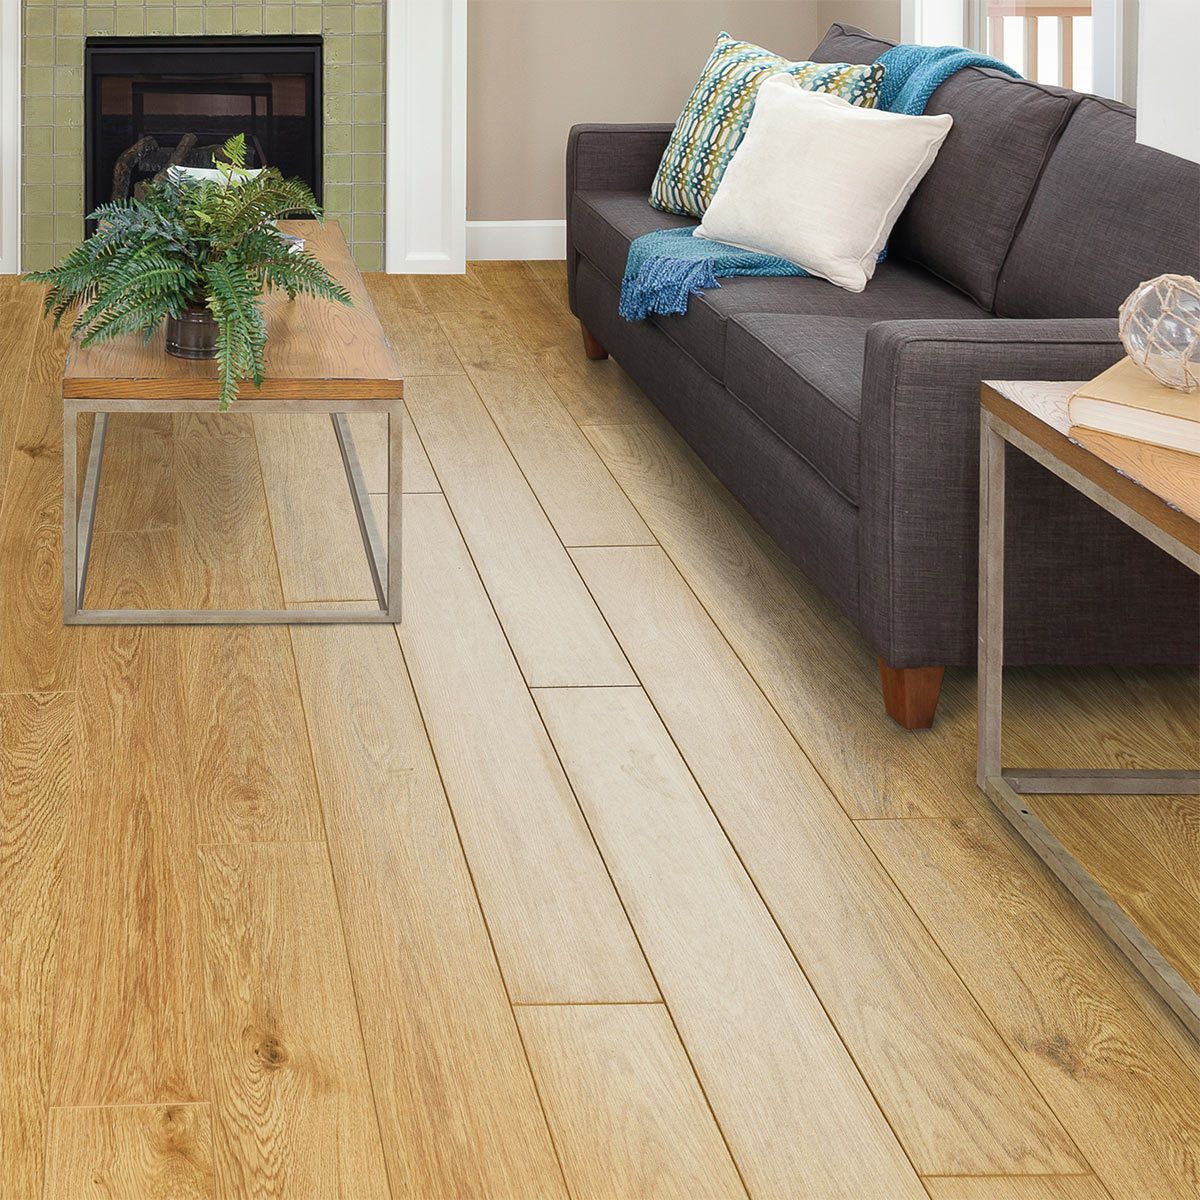 Golden Select Nottingham (Oak) Laminate Flooring with Foam